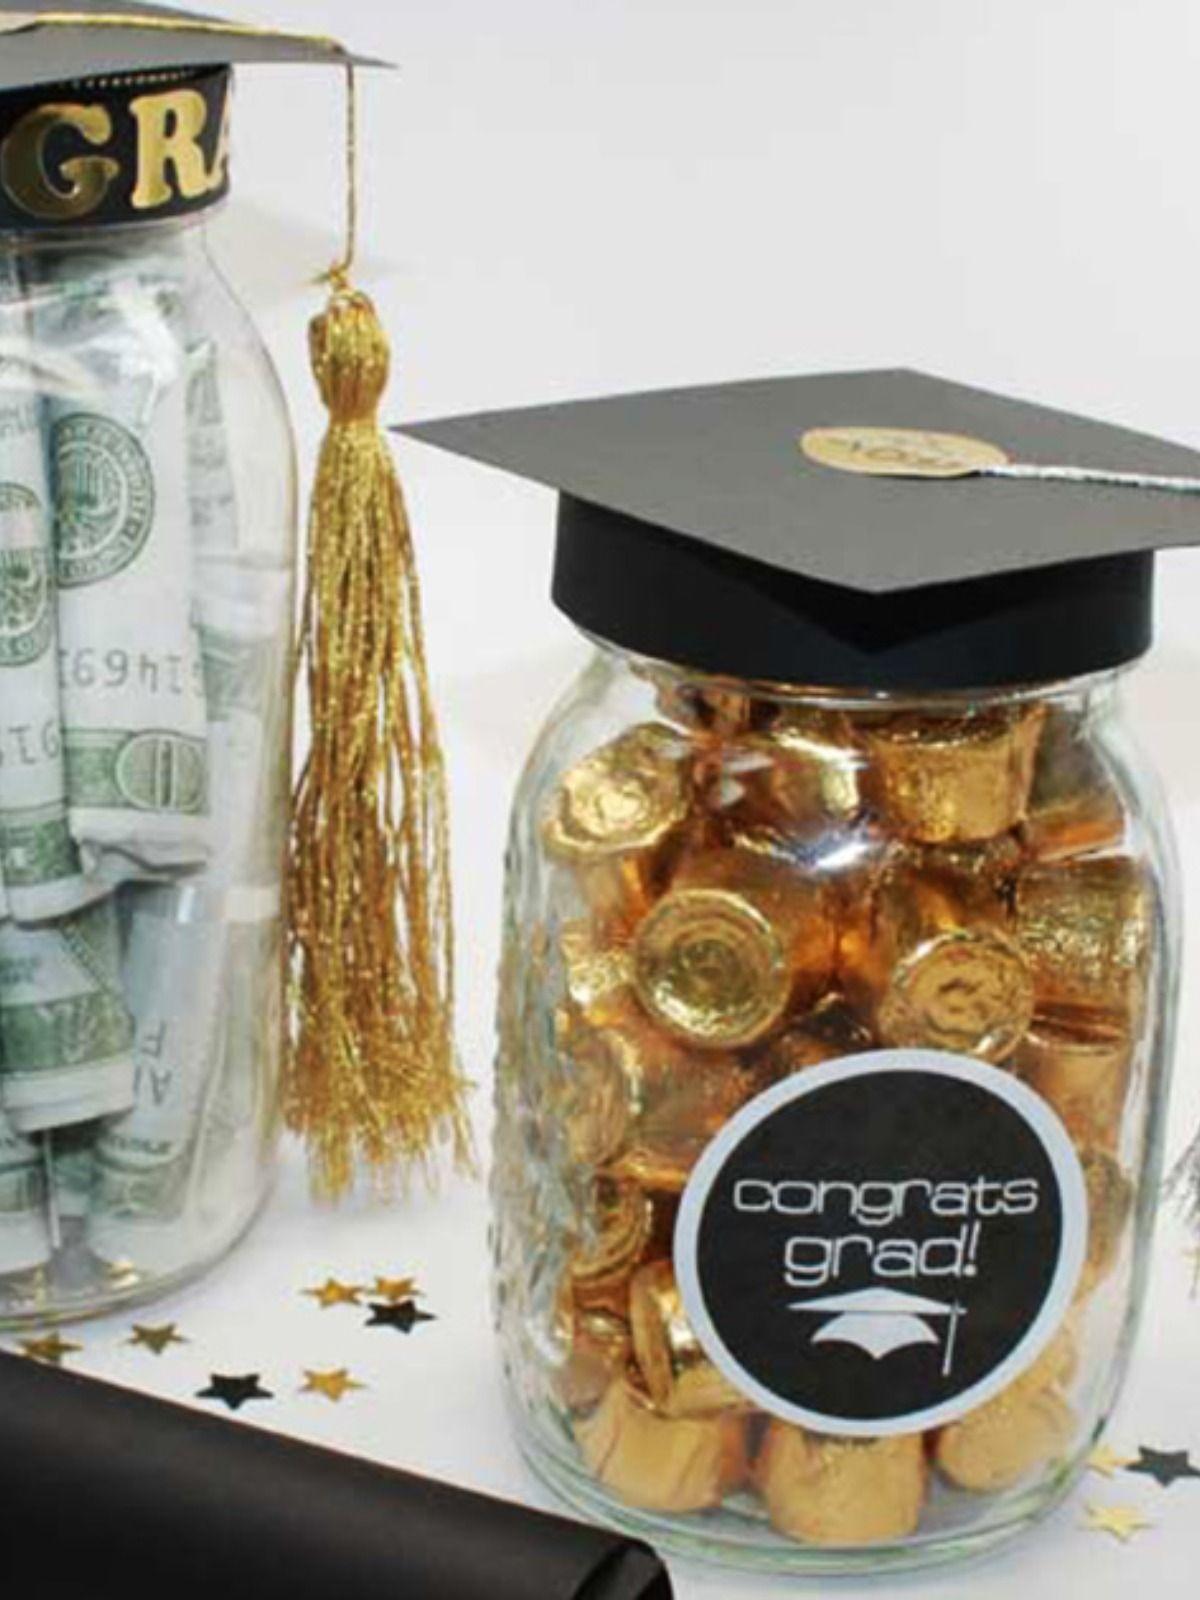 Diy Graduation Mason Jar Party Gifts Favors Free Printable Onlinelabels Com Graduation Mason Jars Graduation Diy Personalized Graduation Gifts